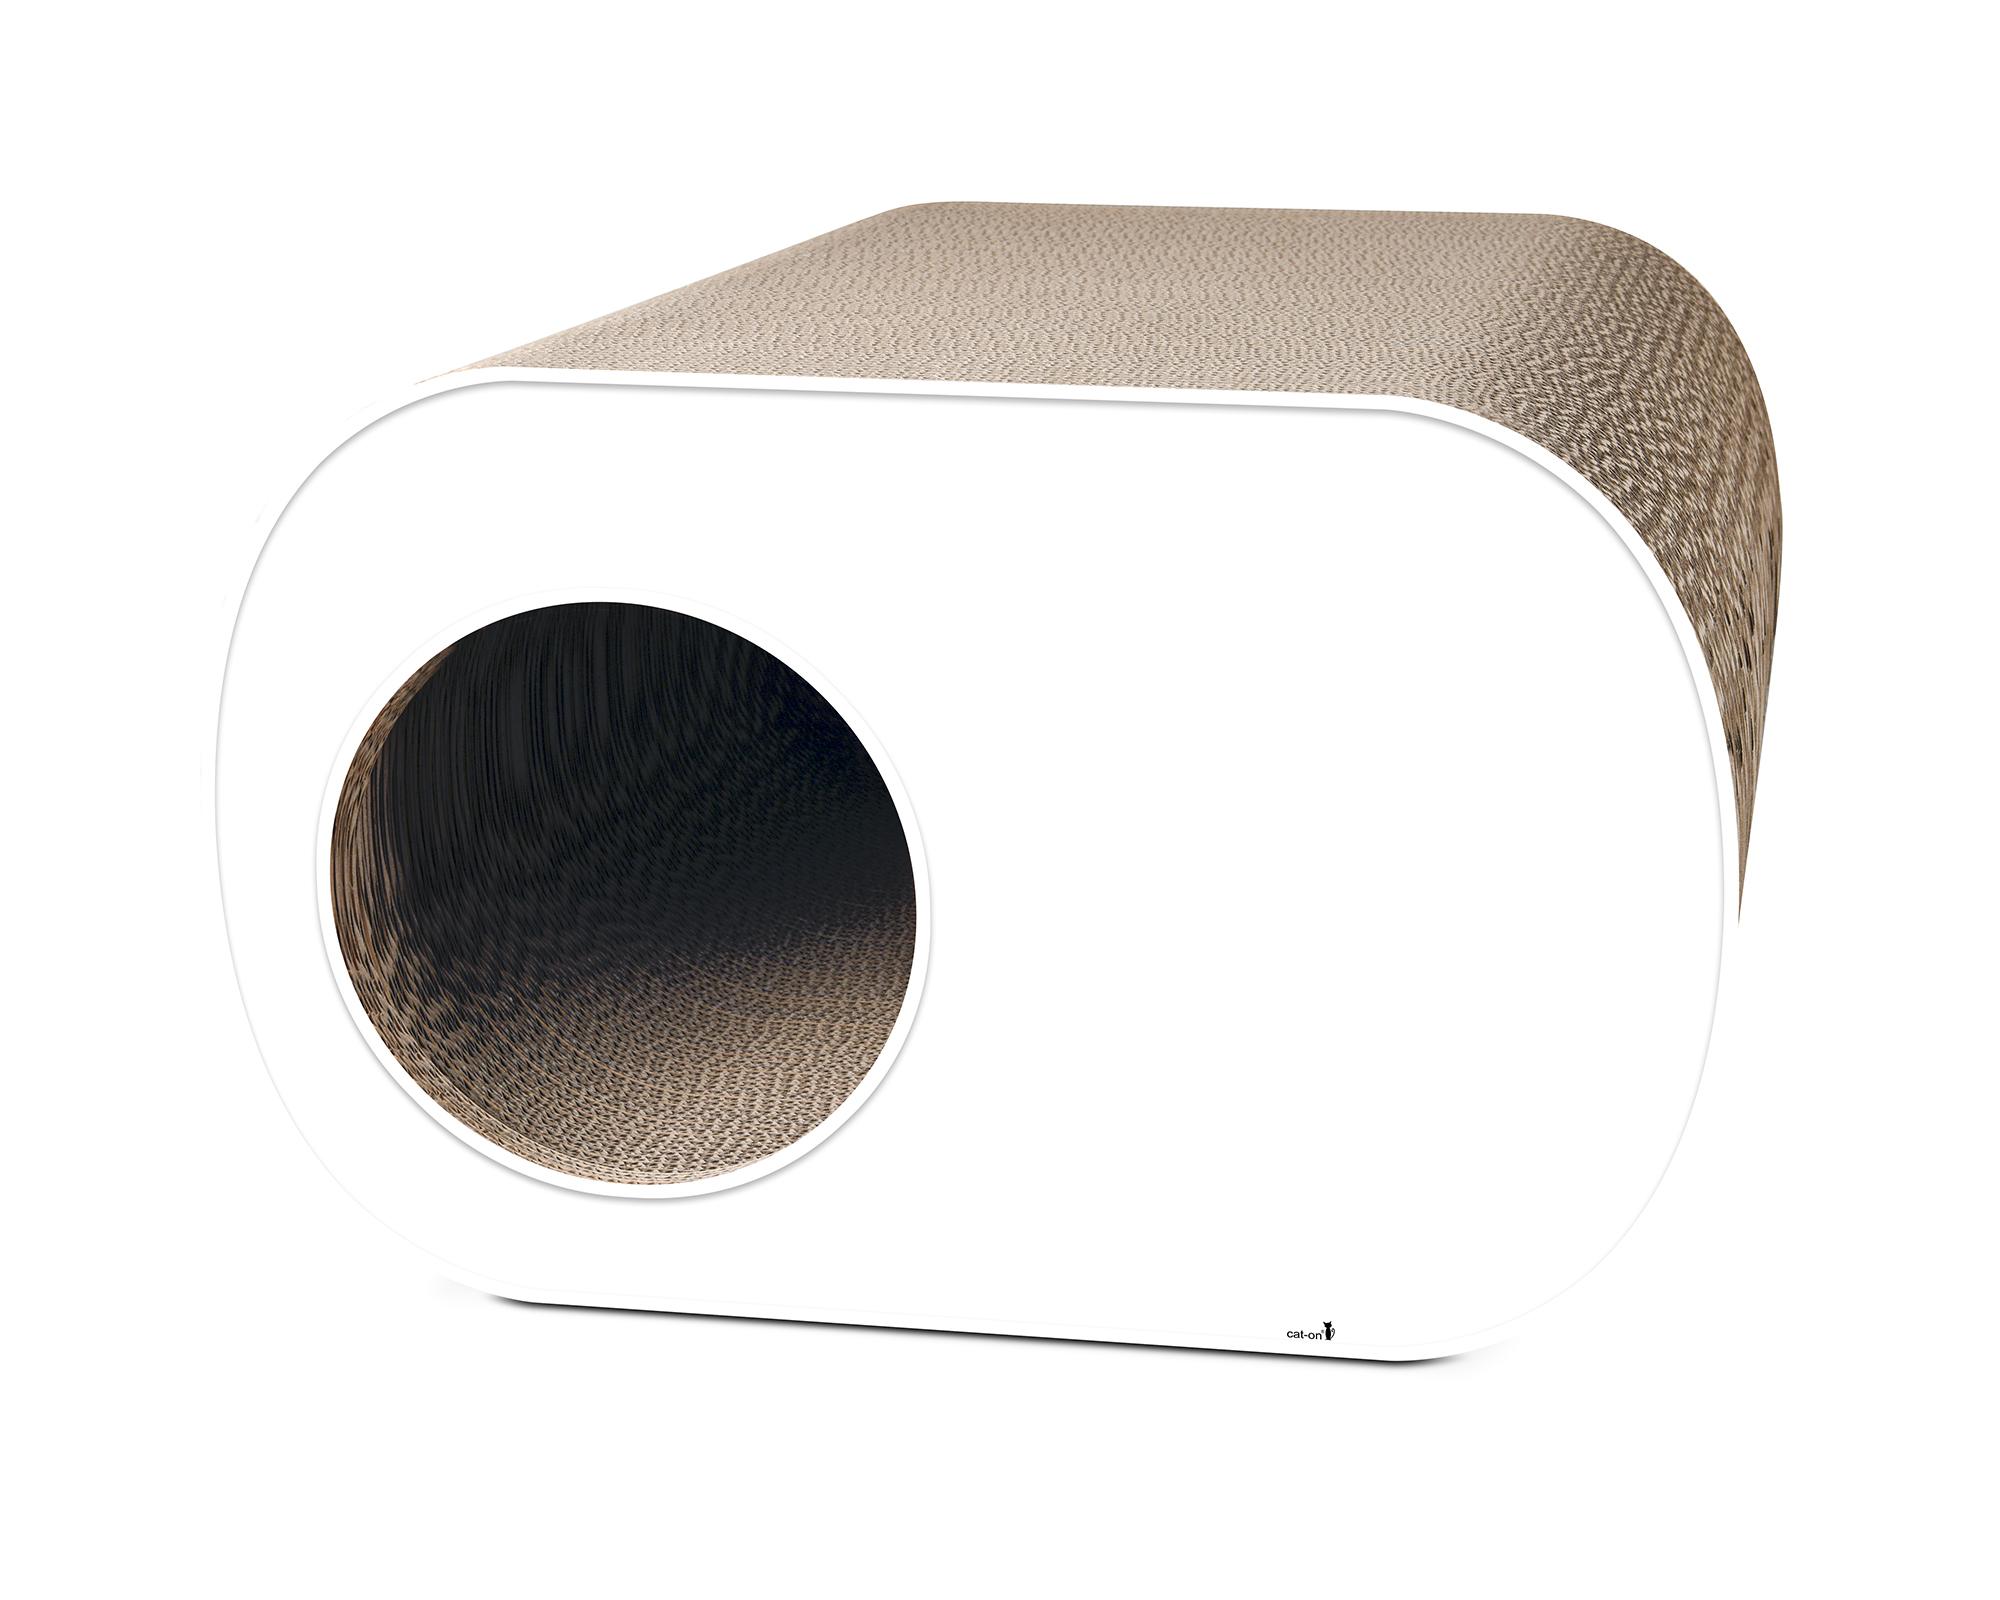 Brochhaus Design Katzenmöbel